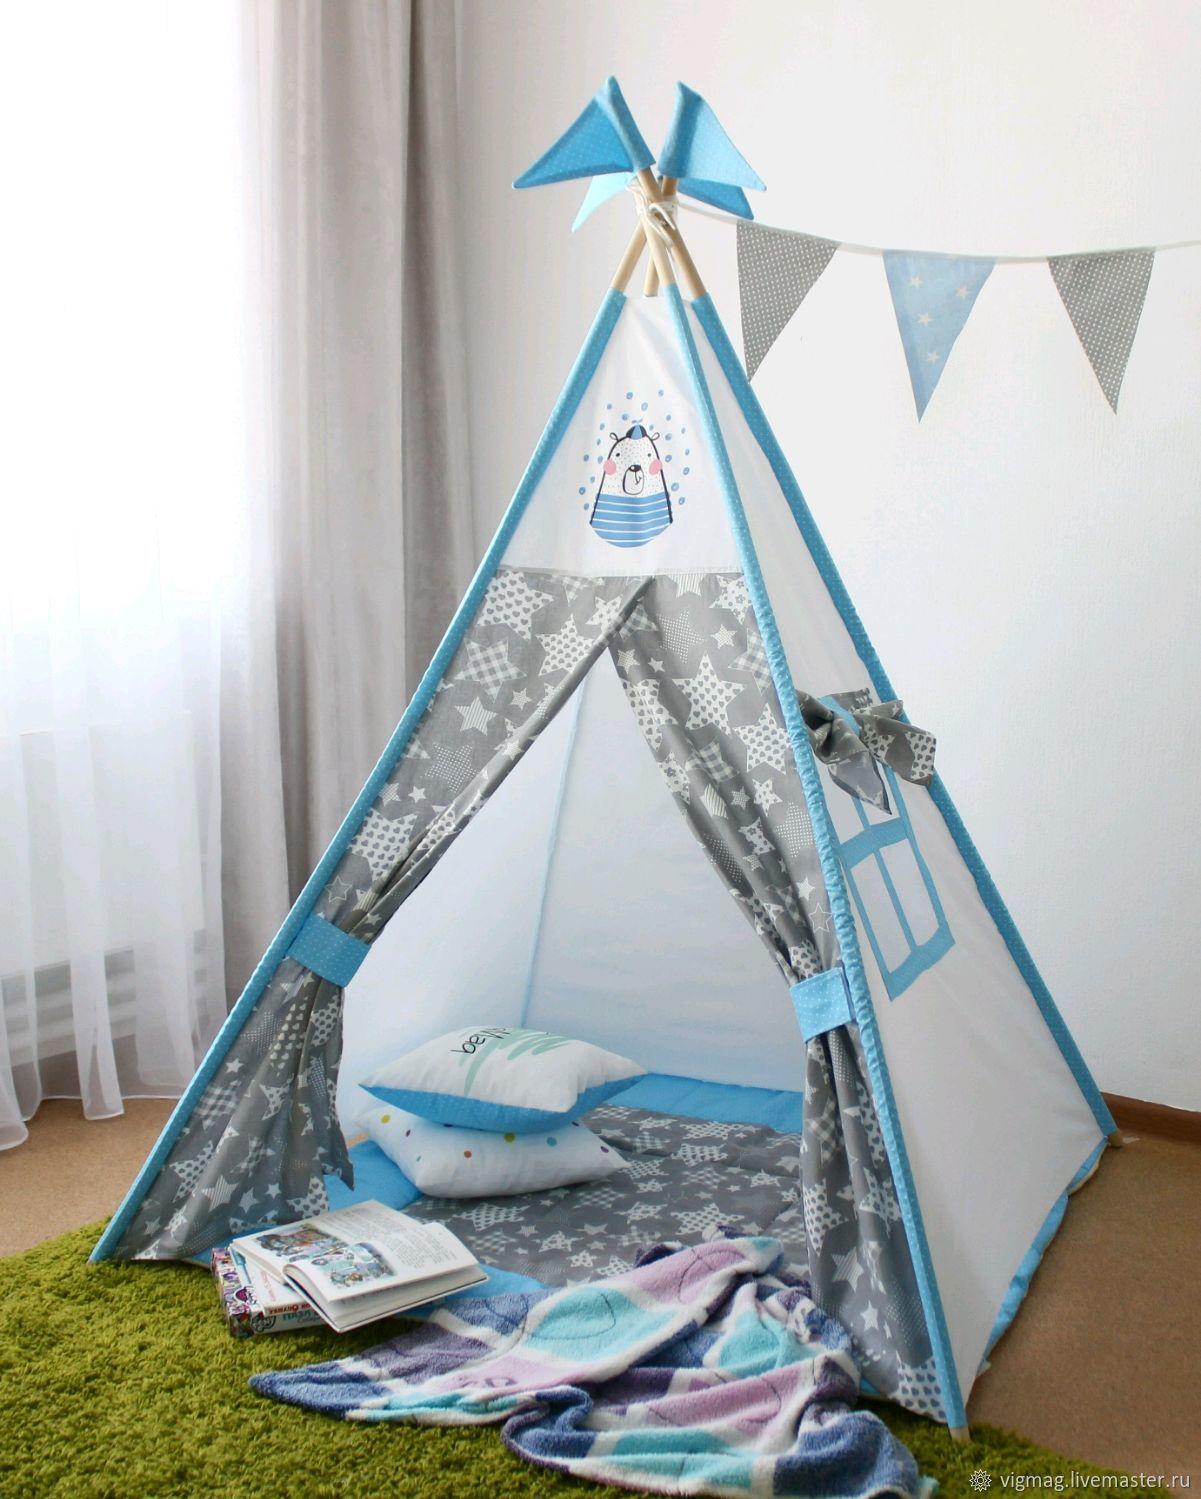 Вигвам в комплекте с системой антискладывания, палатка, шатер, Вигвам, Иваново,  Фото №1